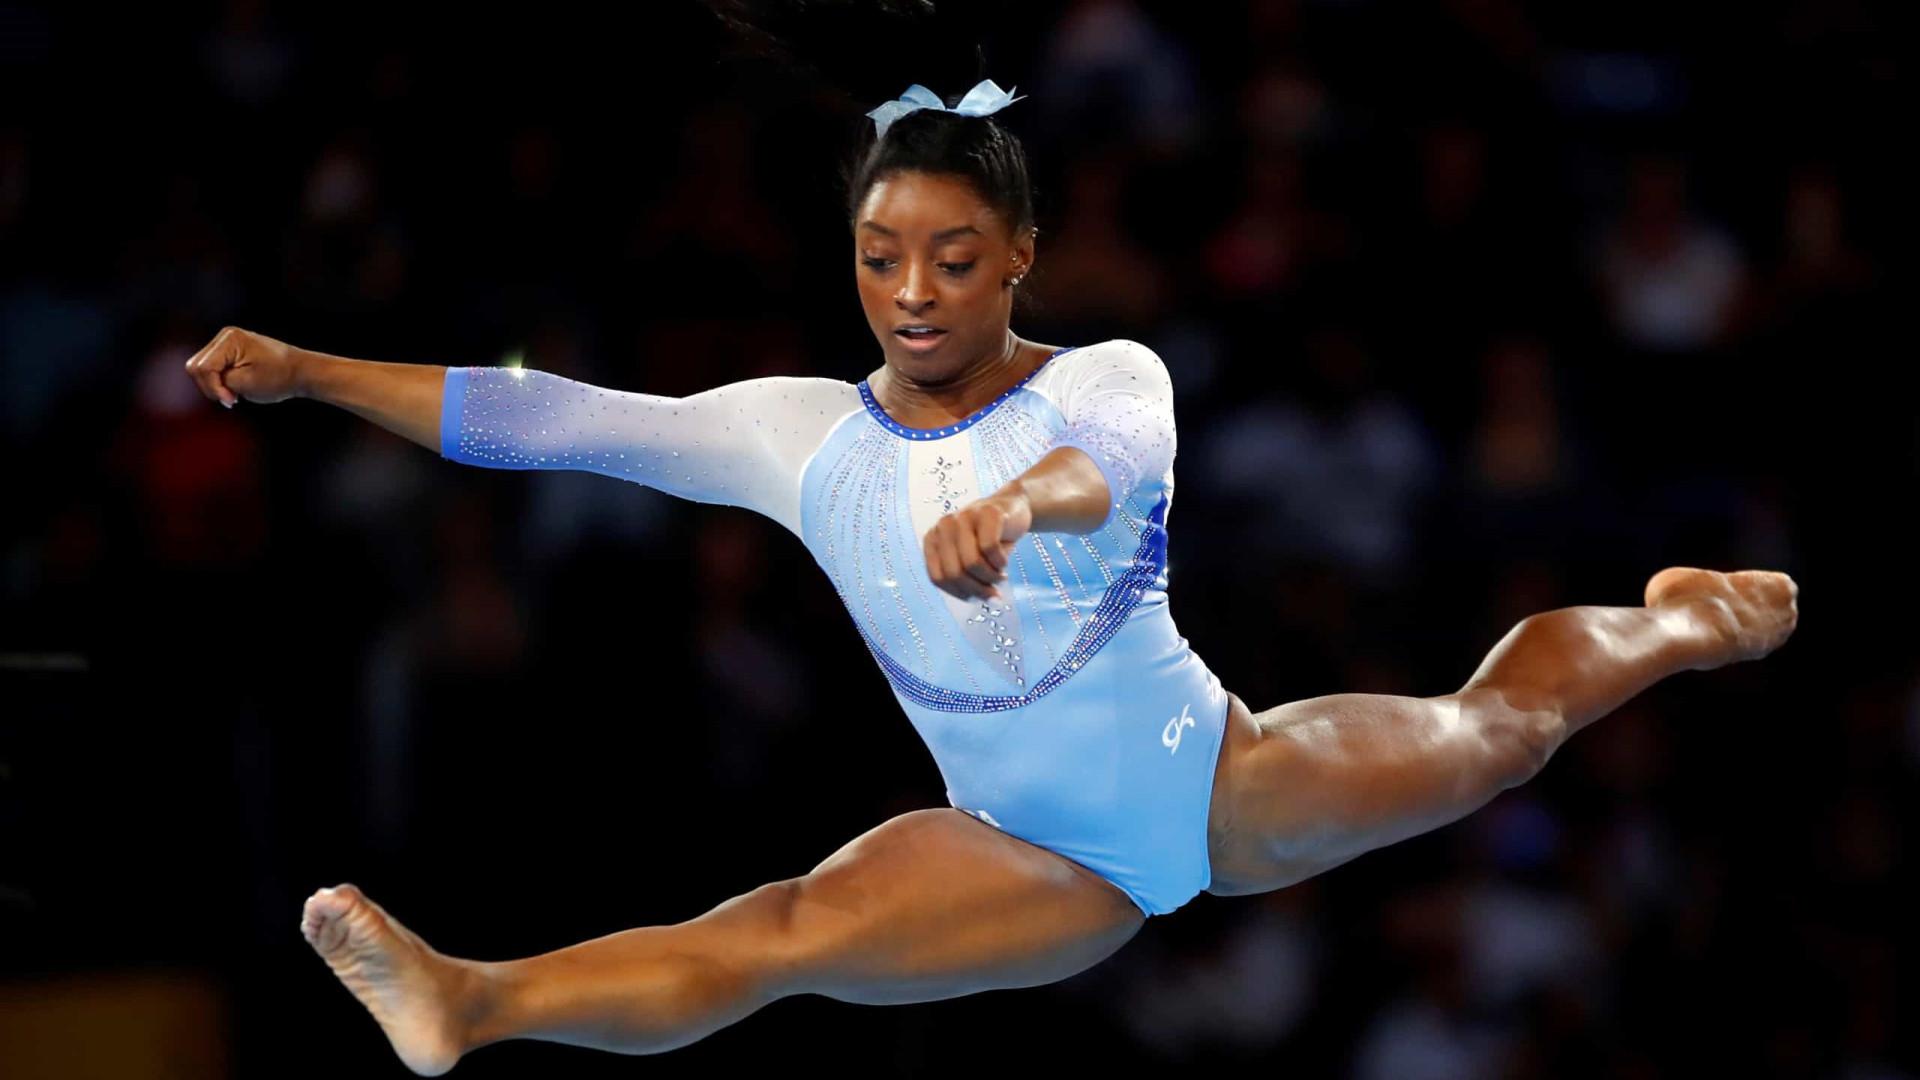 Favorita nos Jogos de Tóquio, Simone Biles diz que busca vencer a si mesma